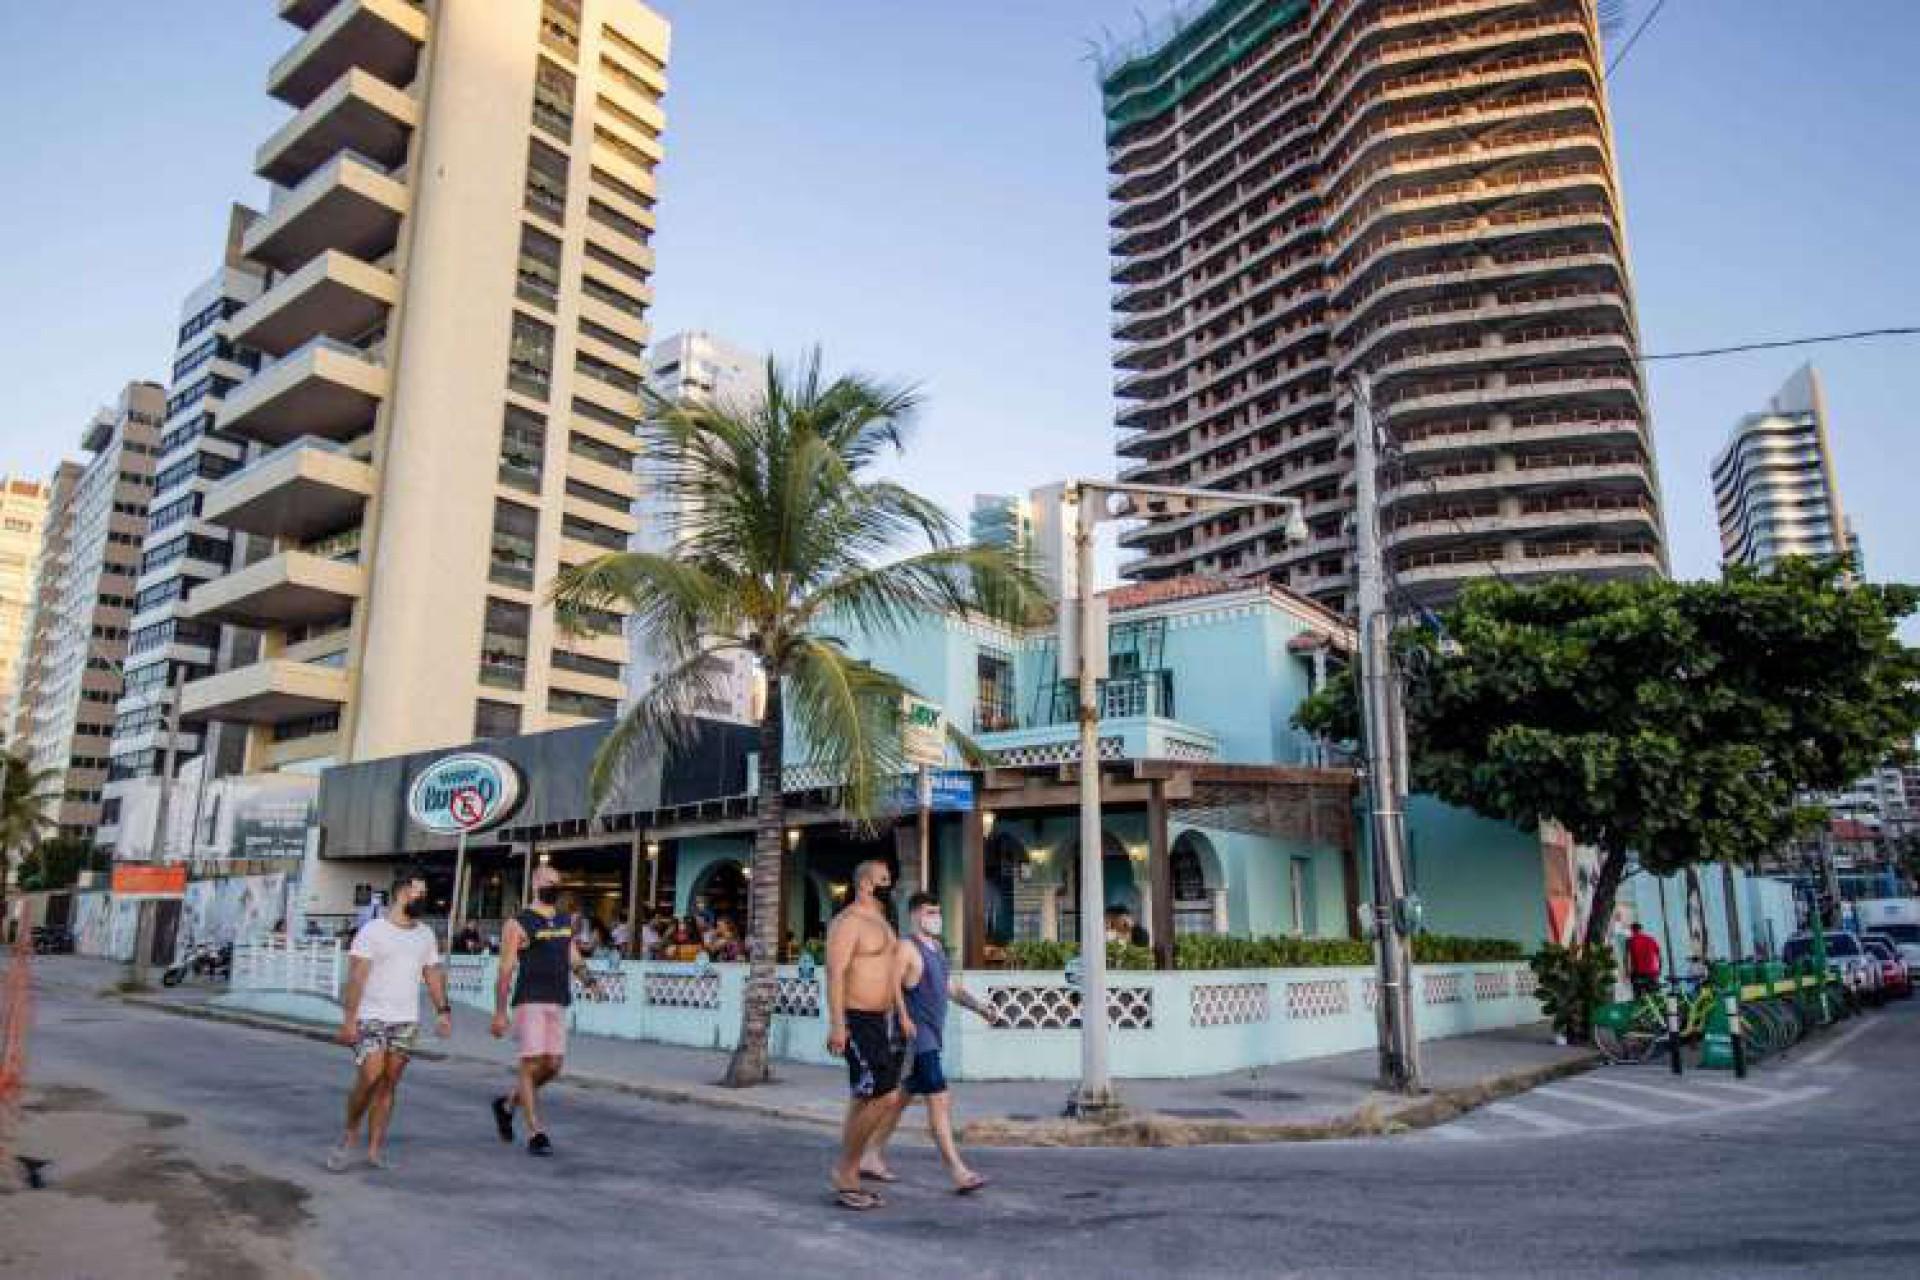 (Foto: AURÉLIO ALVES)Fachada do Boteco Praia, antiga casa da avó paterna do senador Tasso Jereissati